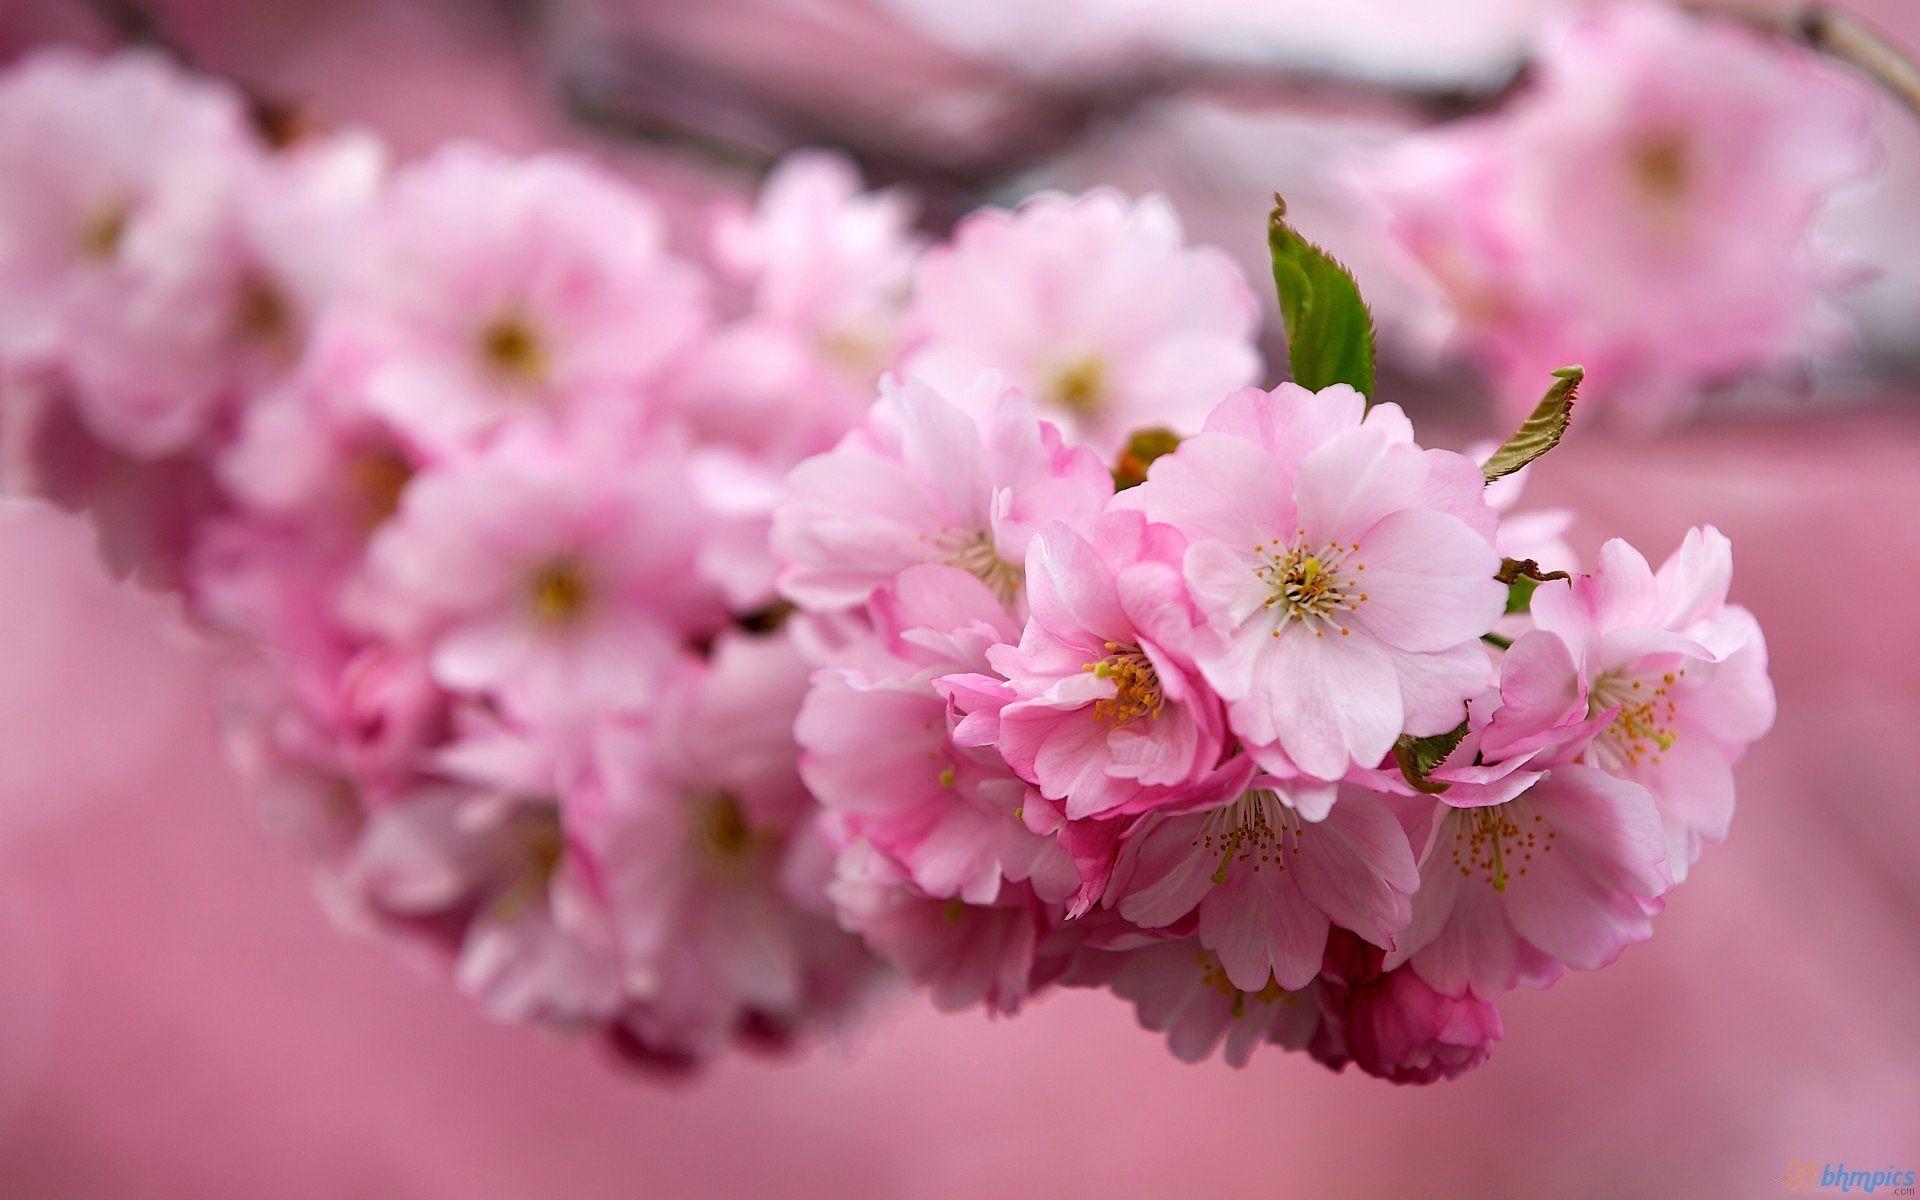 Sakura flower background Japanese images download